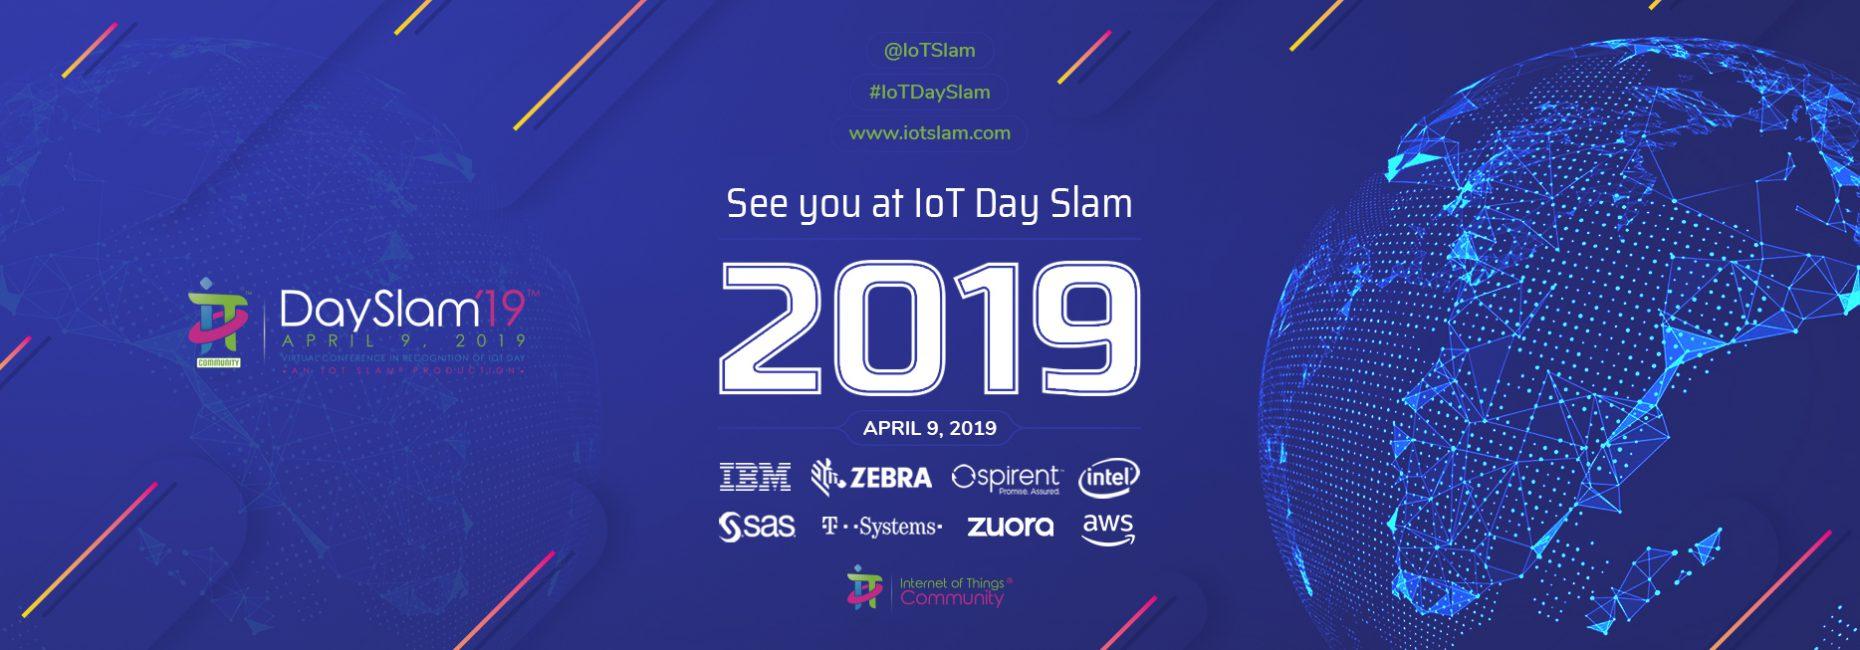 IoT Day Slam, April 9th, 2019 Virtual Conference Agenda